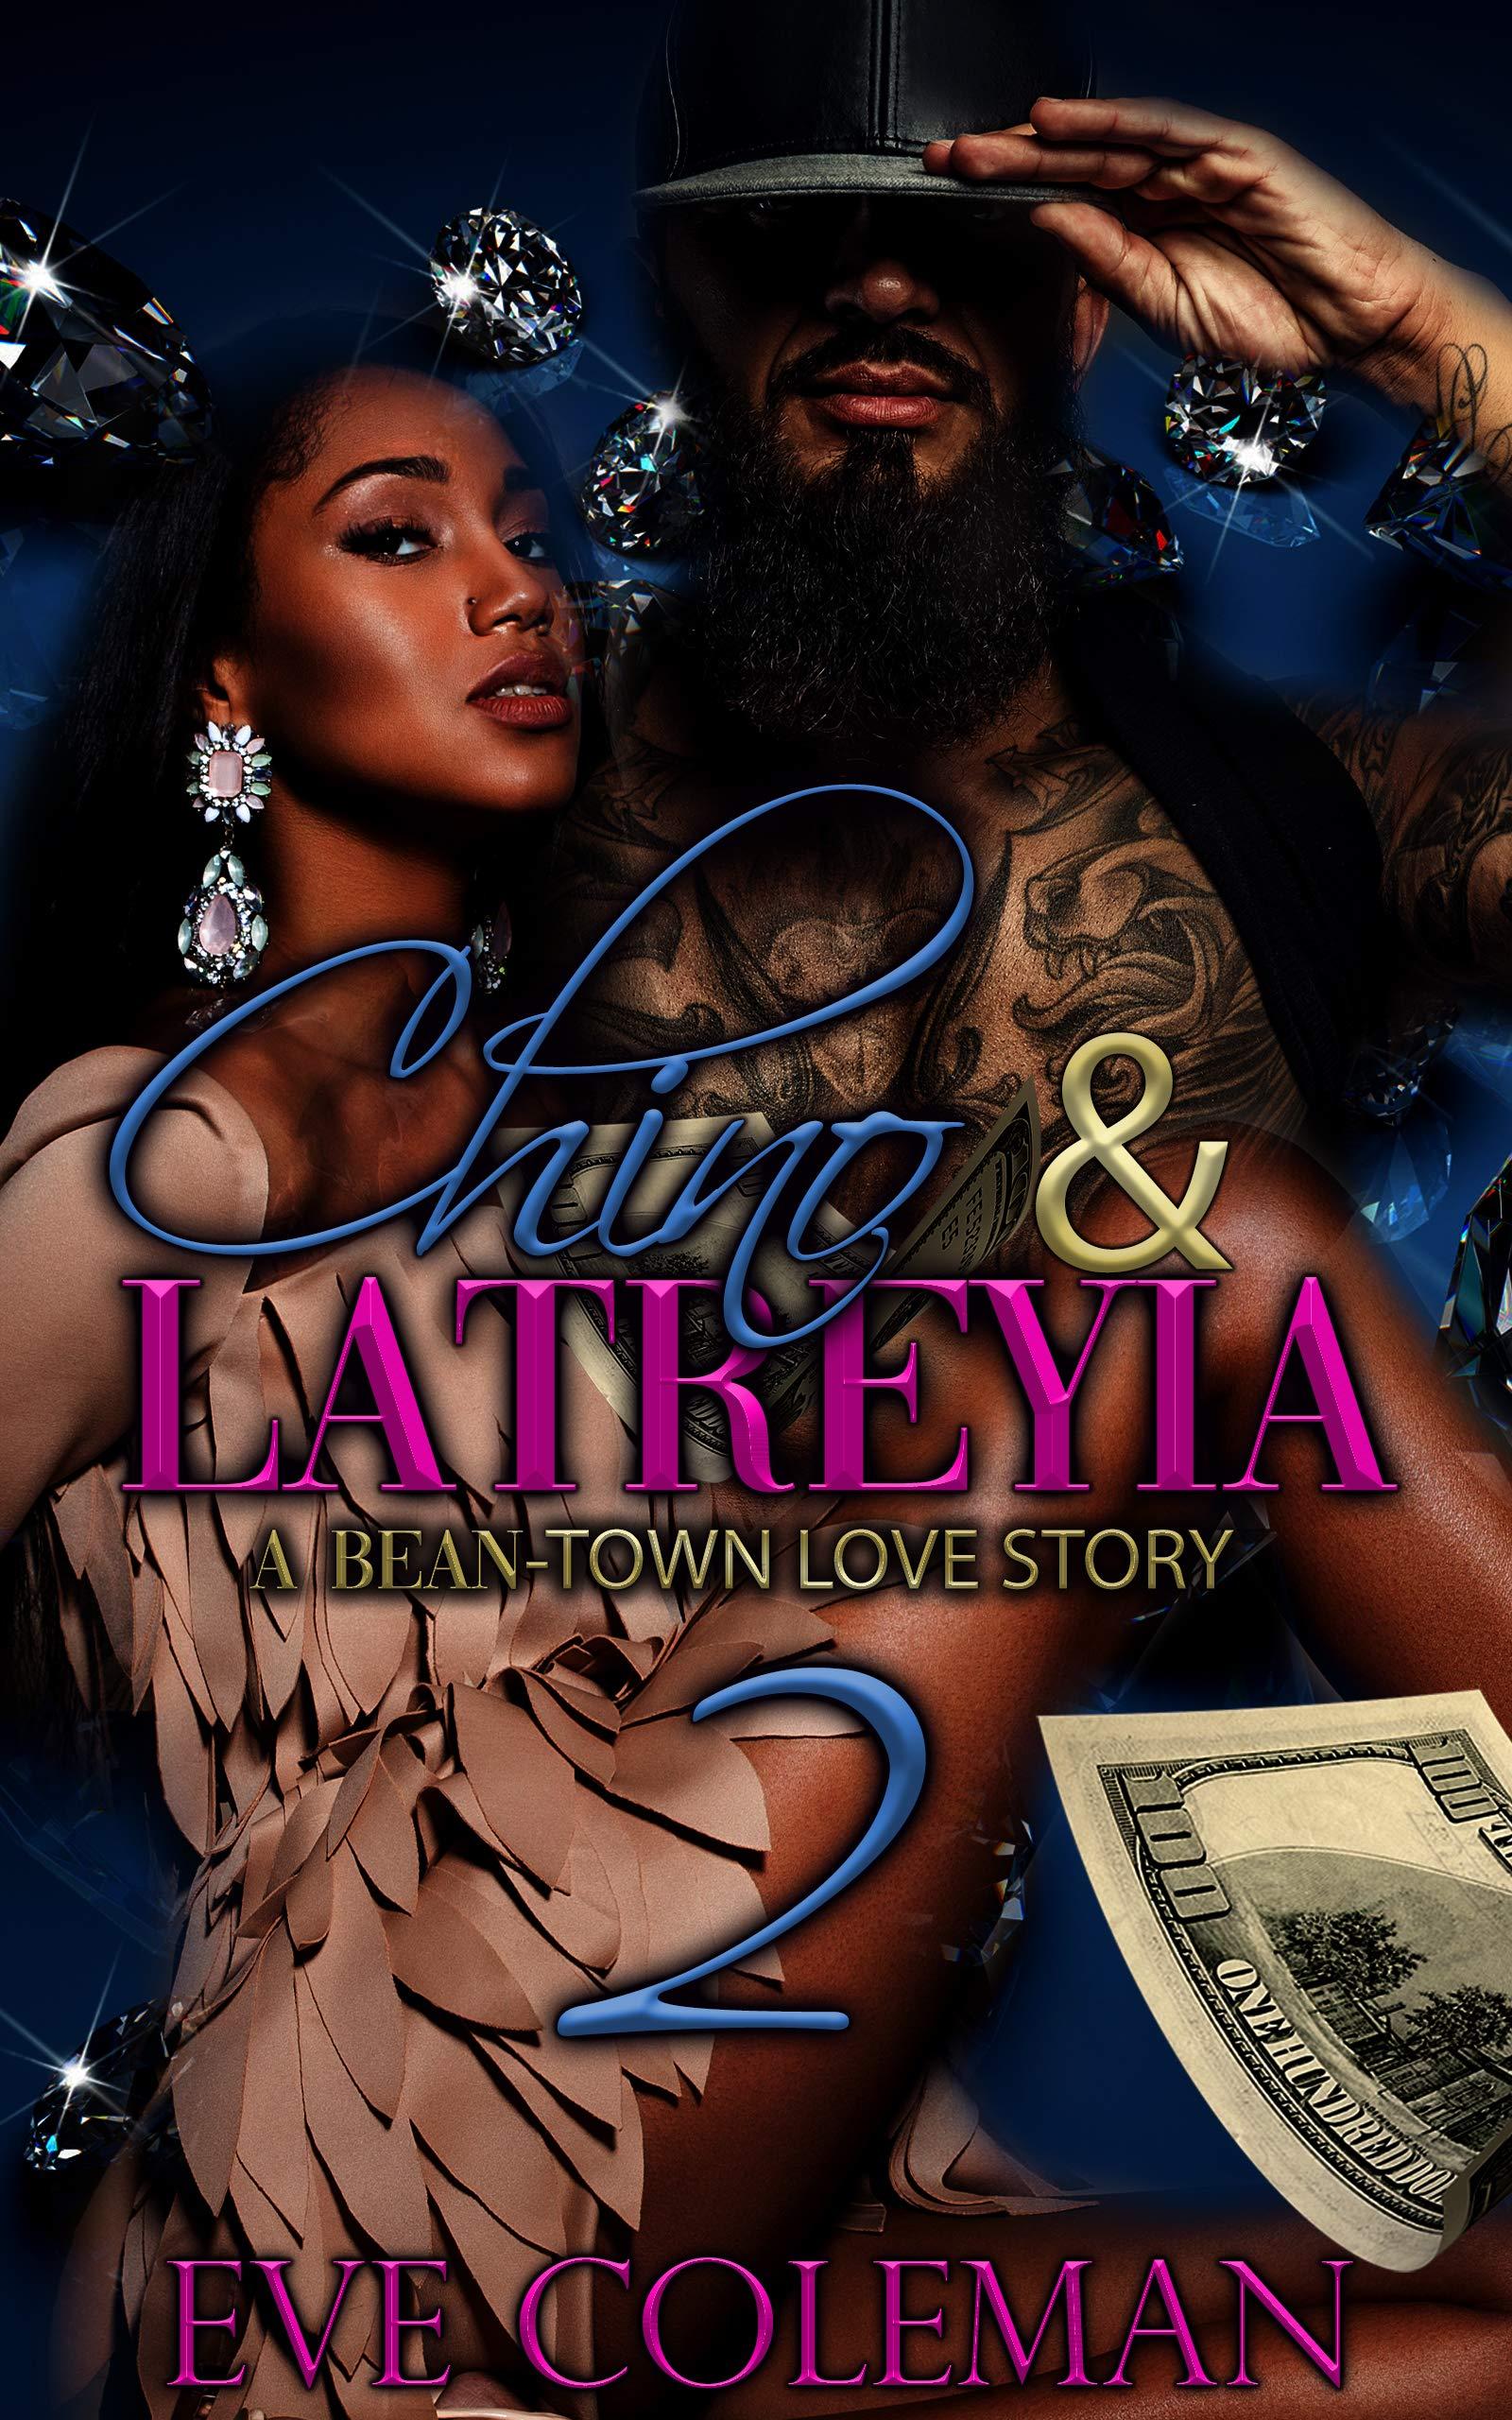 Chino & Latreyia 2: A Bean-Town Love Story